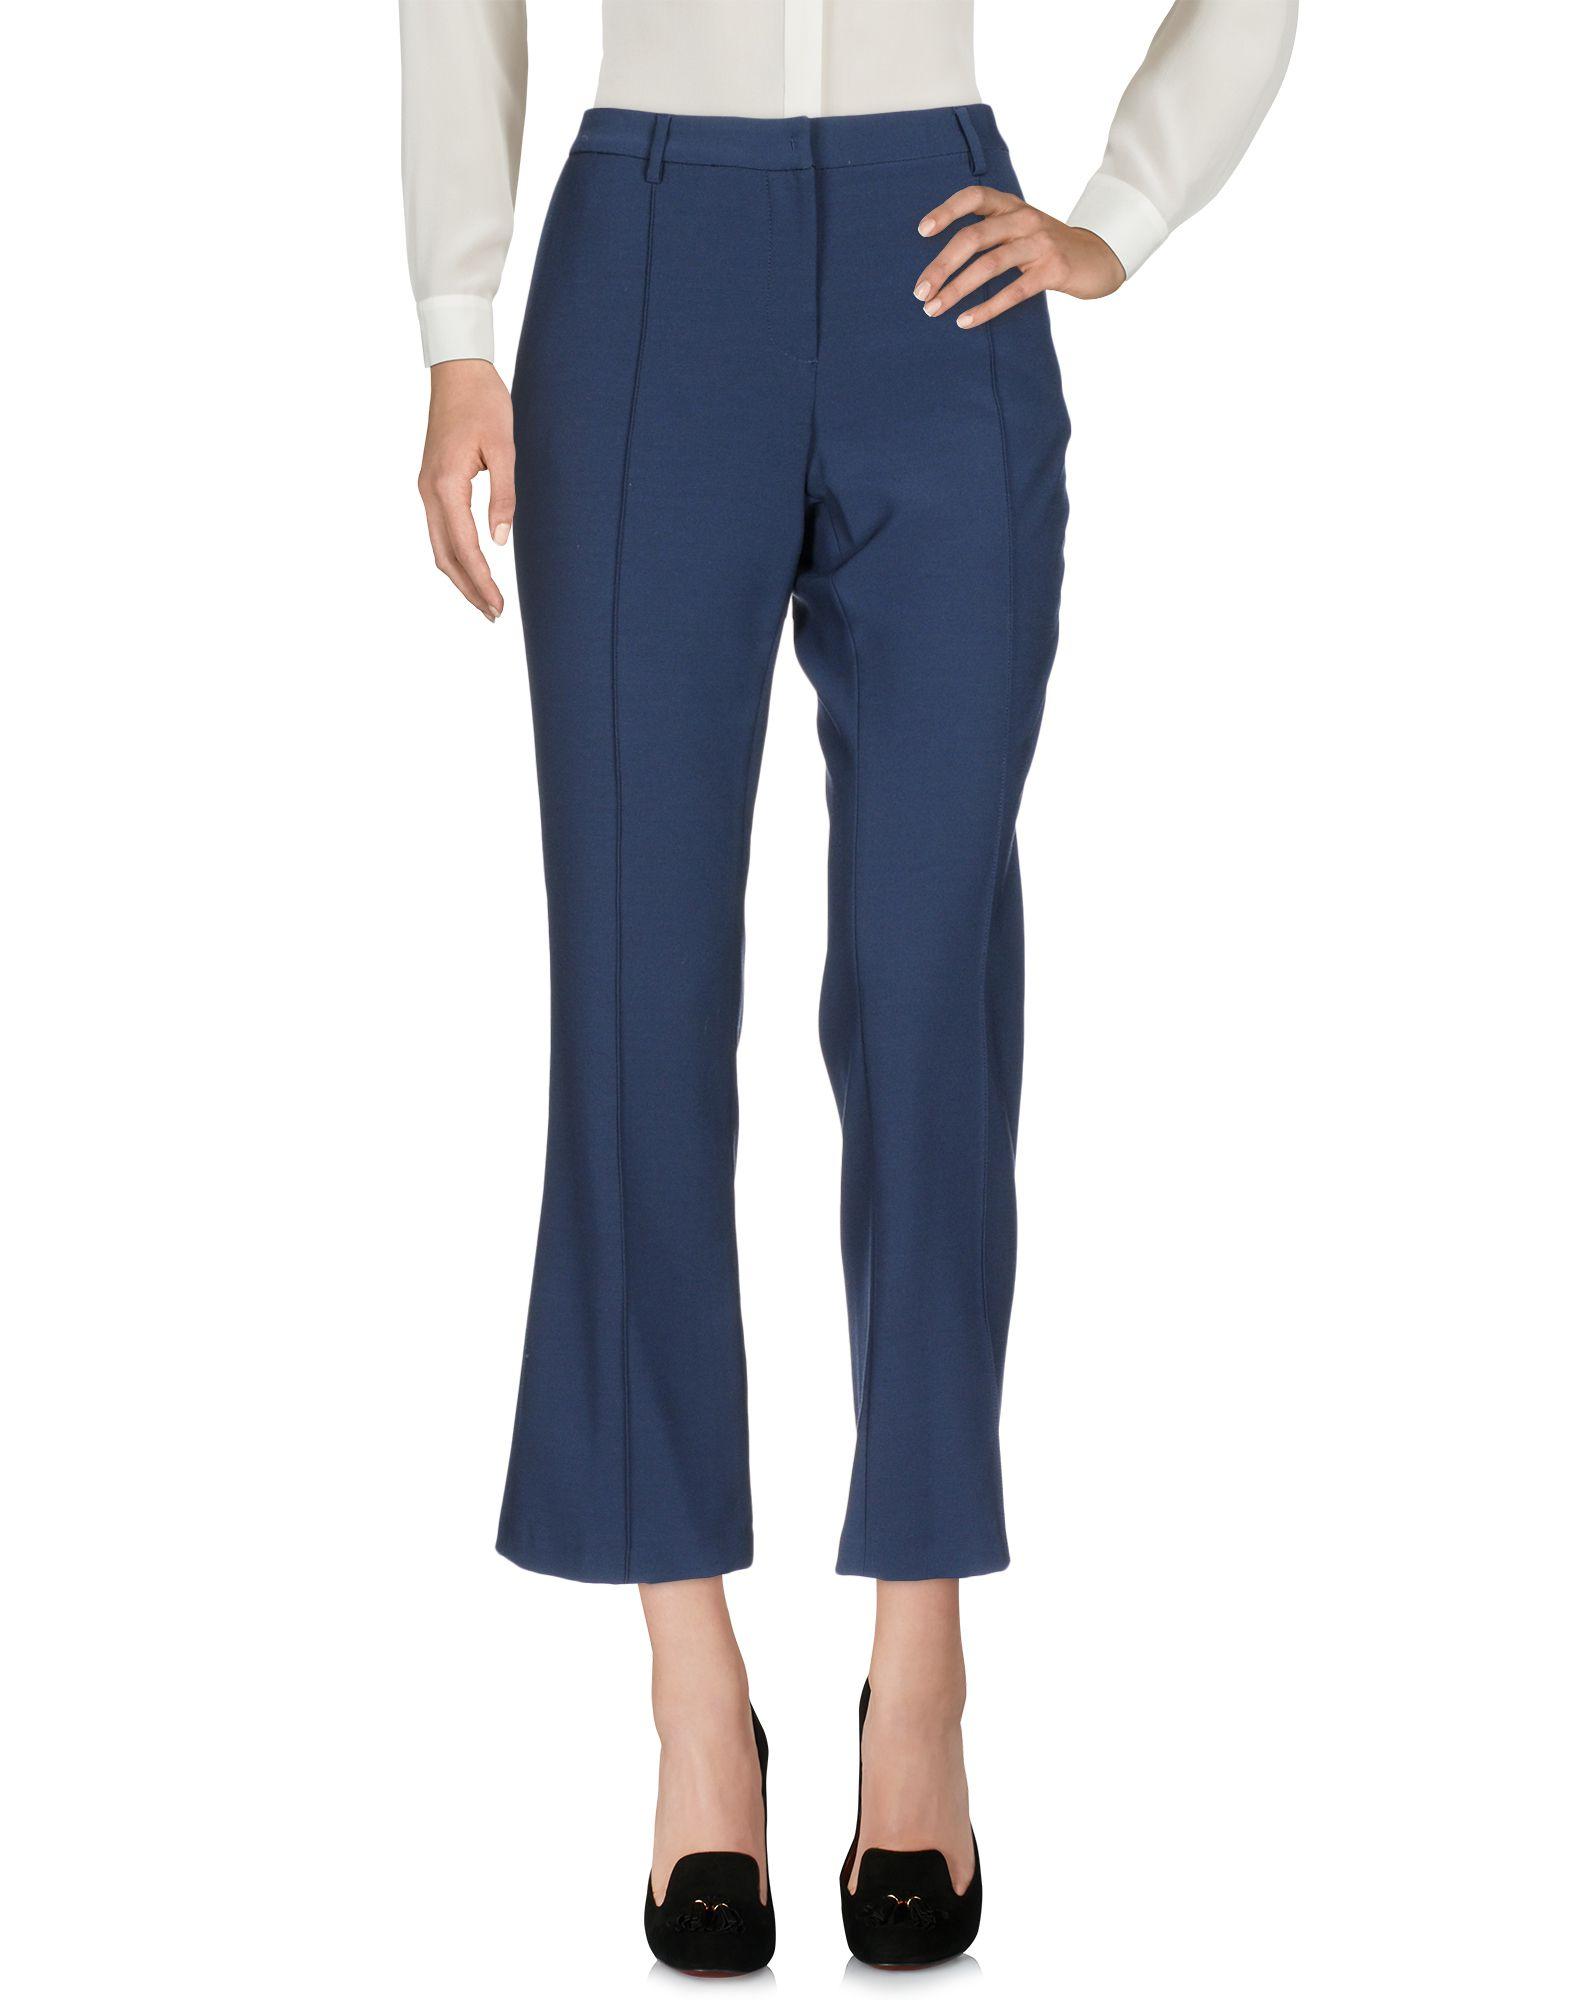 Pantalone Niū Donna - Acquista online su YDkXVr